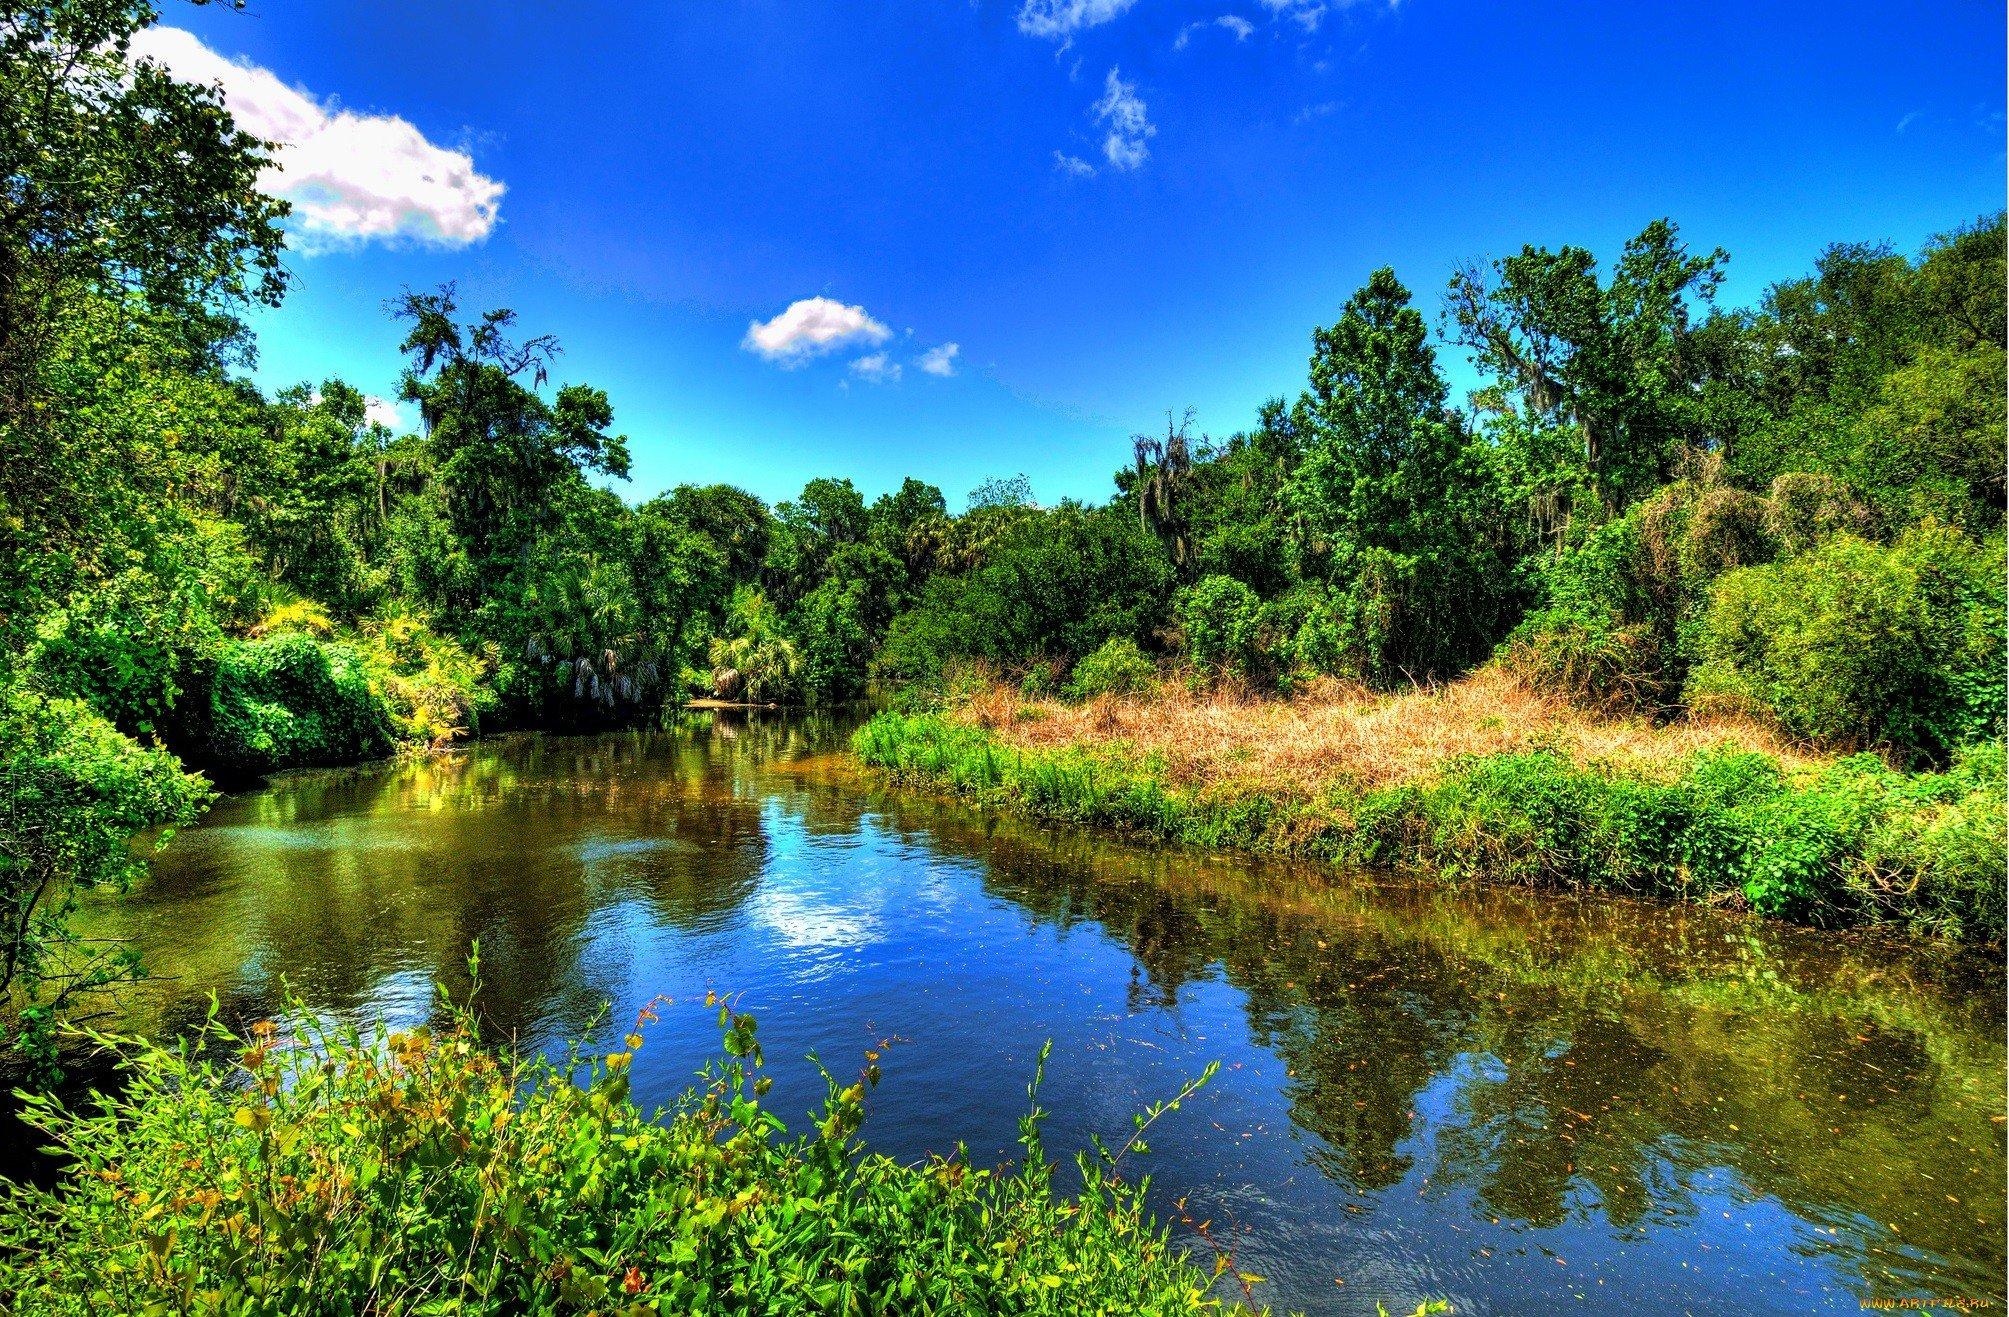 картинки речка лес лето красивенная страна, красивыми